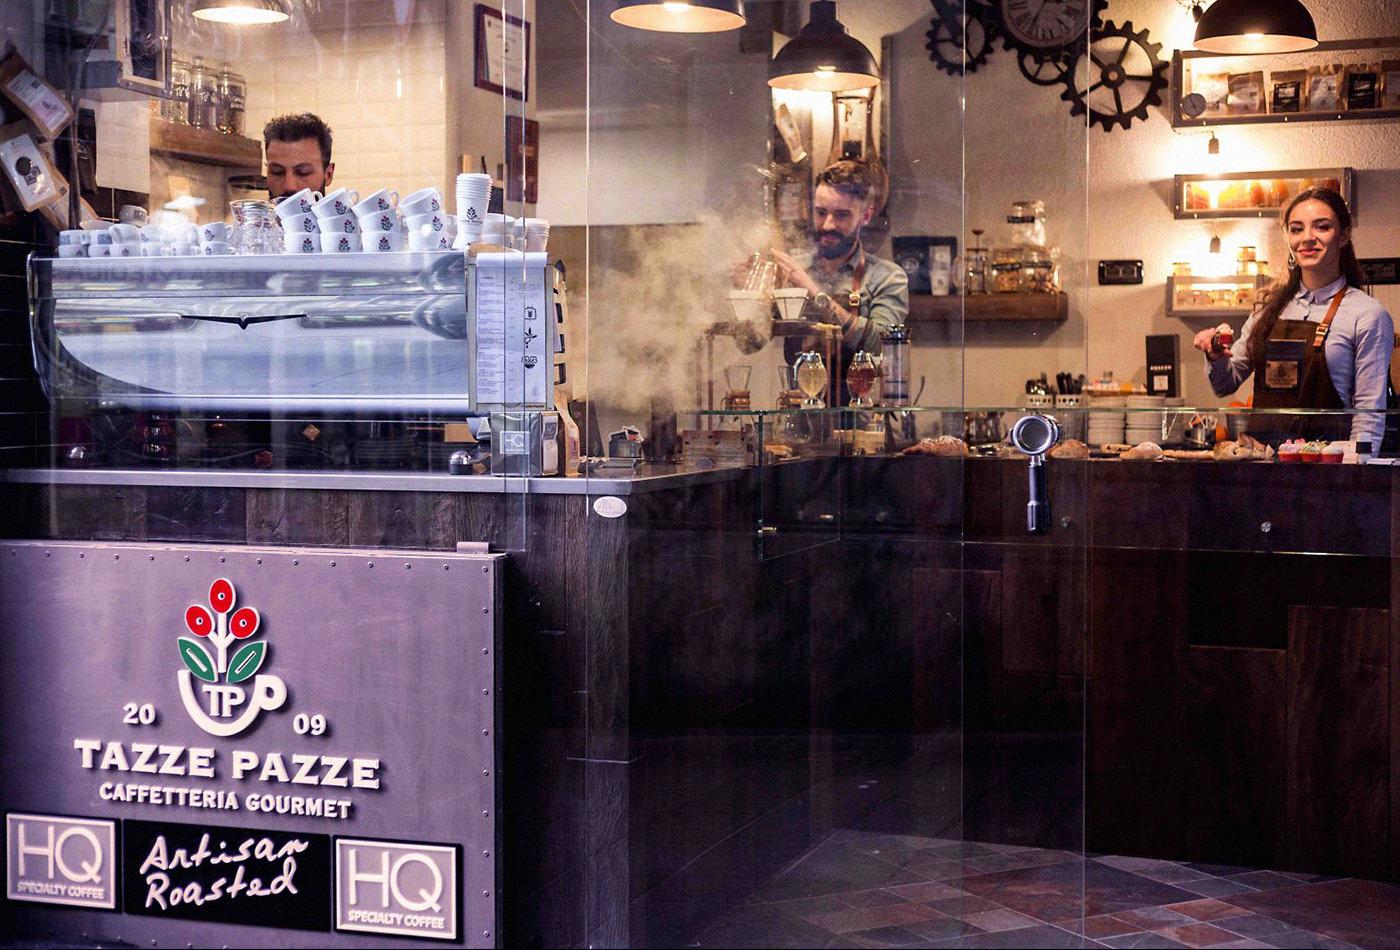 tazze-pazze-caffetteria-gourmet-genova-coffee-specialty-brewing-andrea-cremone-barista-baristas-branding-vacaliebres-logo-brand-tp